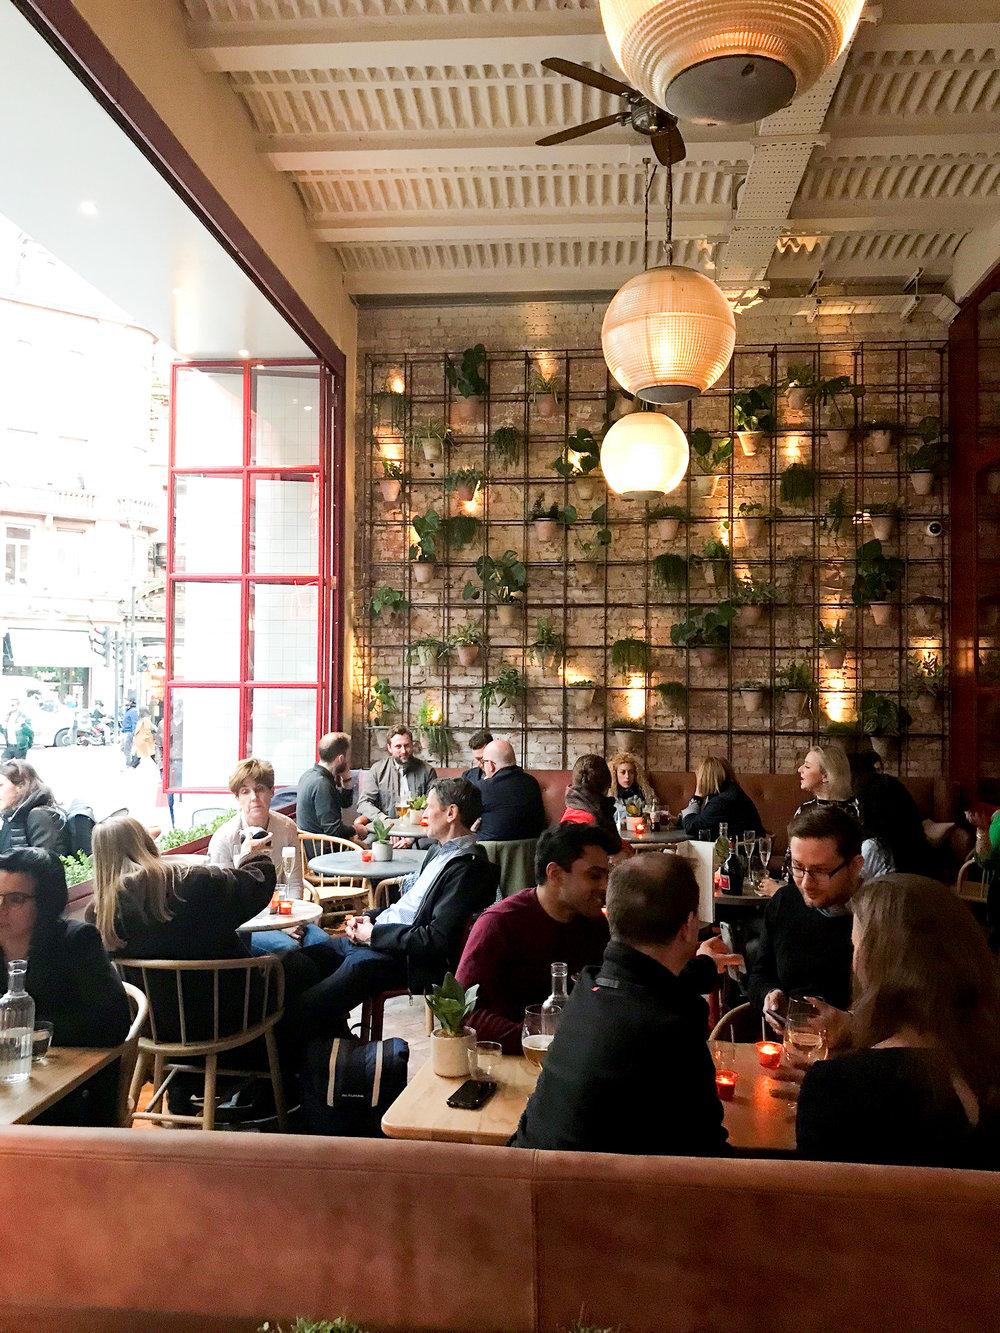 WestEnd cafe-2.jpg